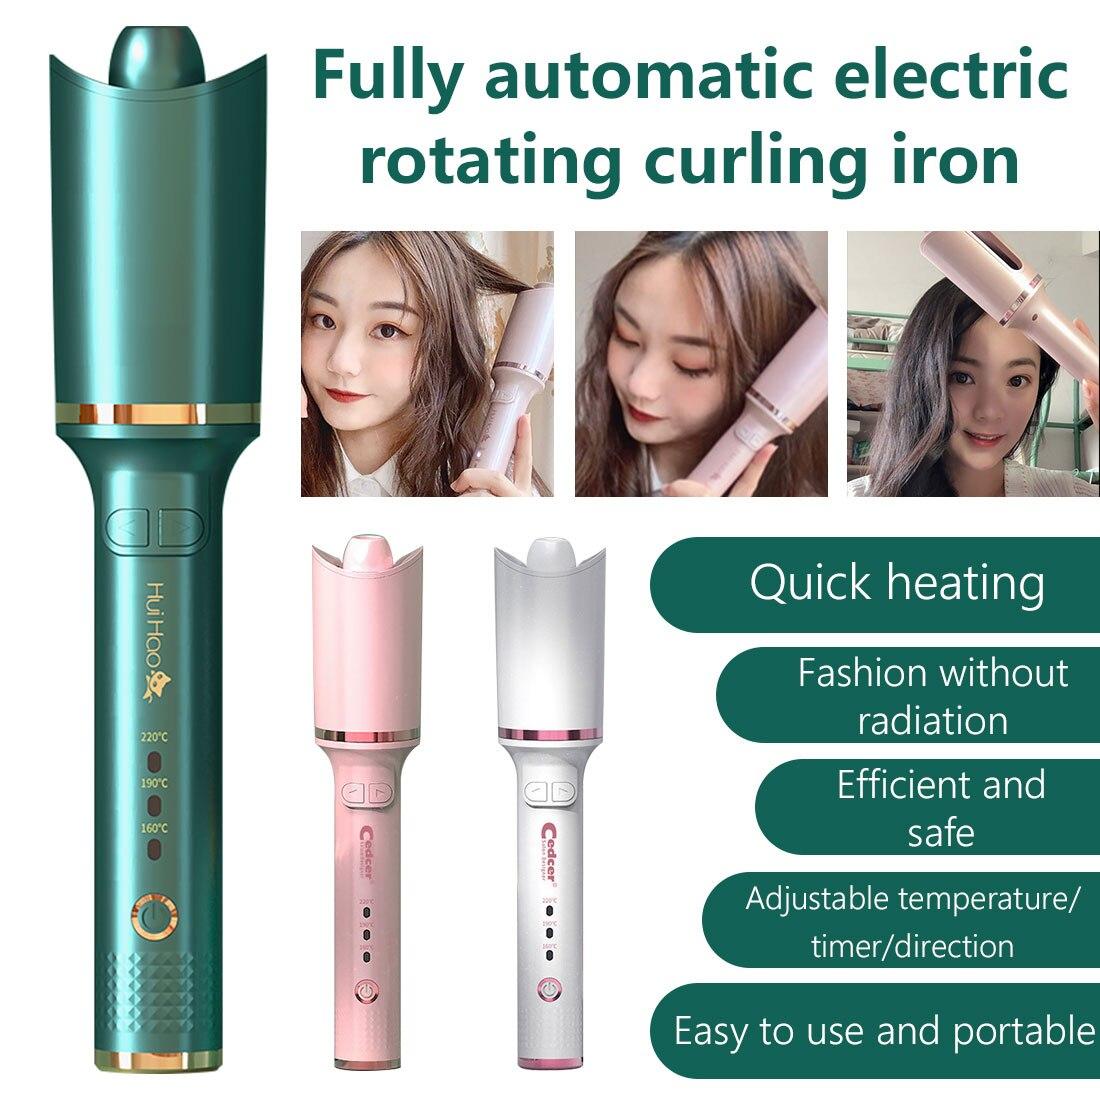 Curling Ferro automático Air Curler Cerâmica Rotativa